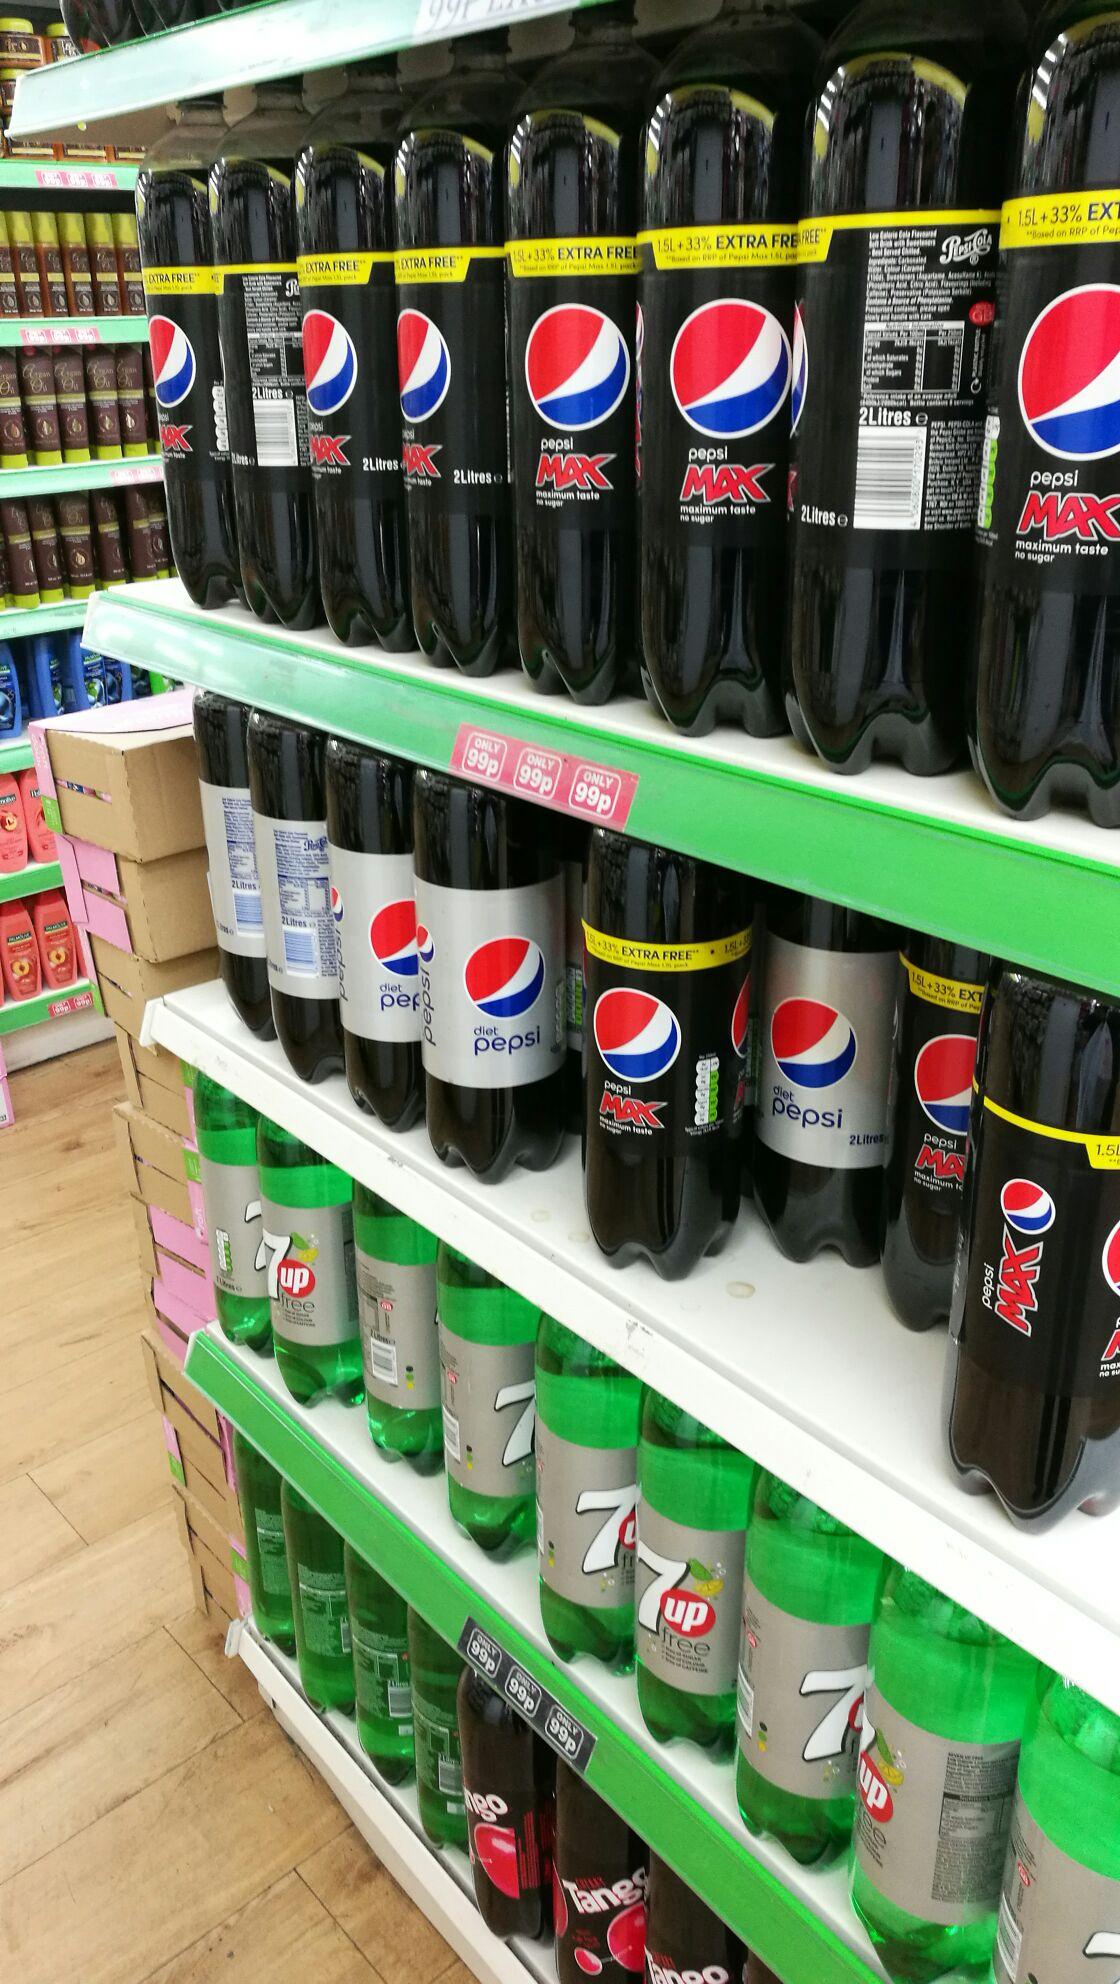 Sams 99p store. 2 litres of Pepsi 99p.